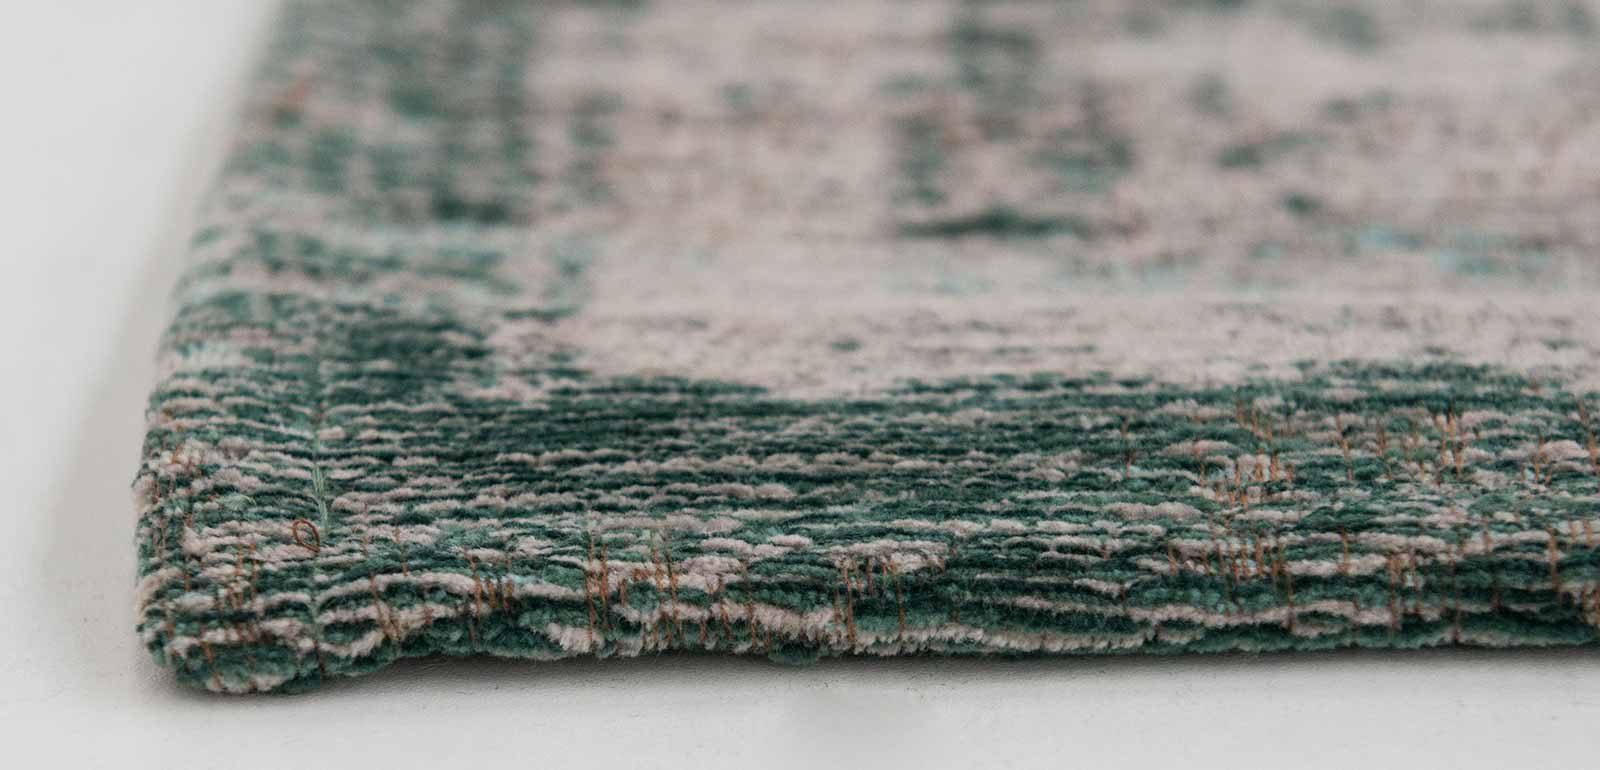 alfombras Louis De Poortere LX8259 Fading World Medaillon Jade Oyster side